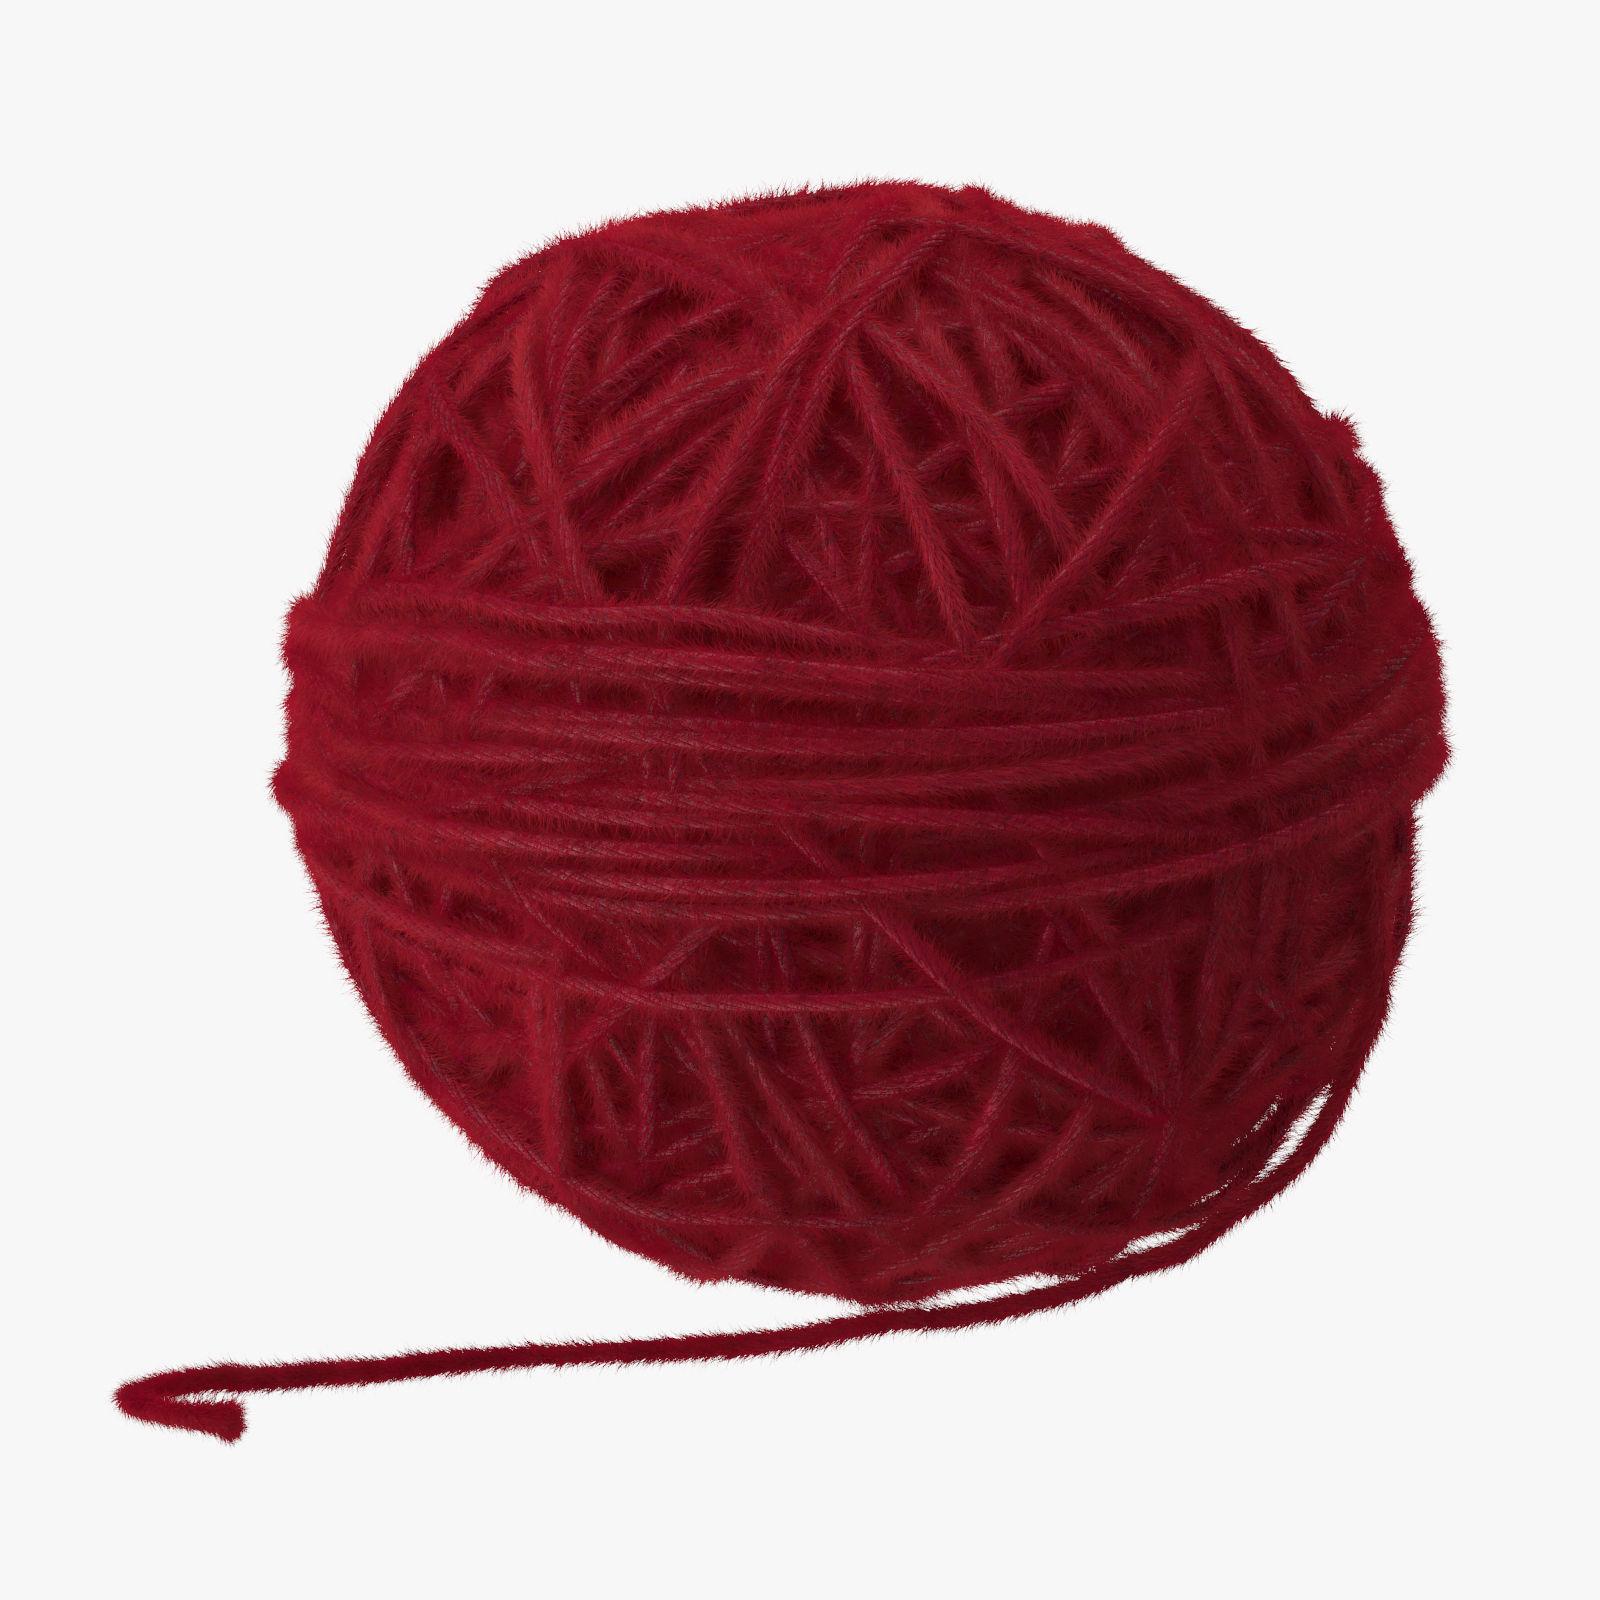 Ball of yarn photo